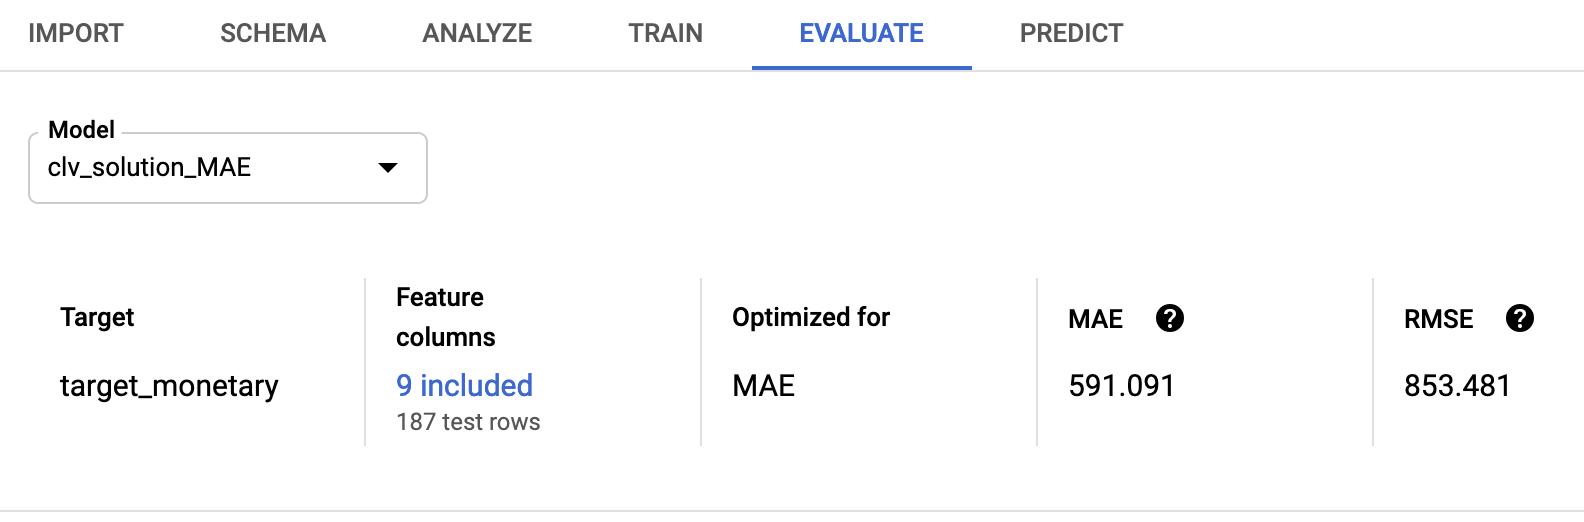 Pestaña Evaluate (Evaluar) de la consola de AutoMLTables